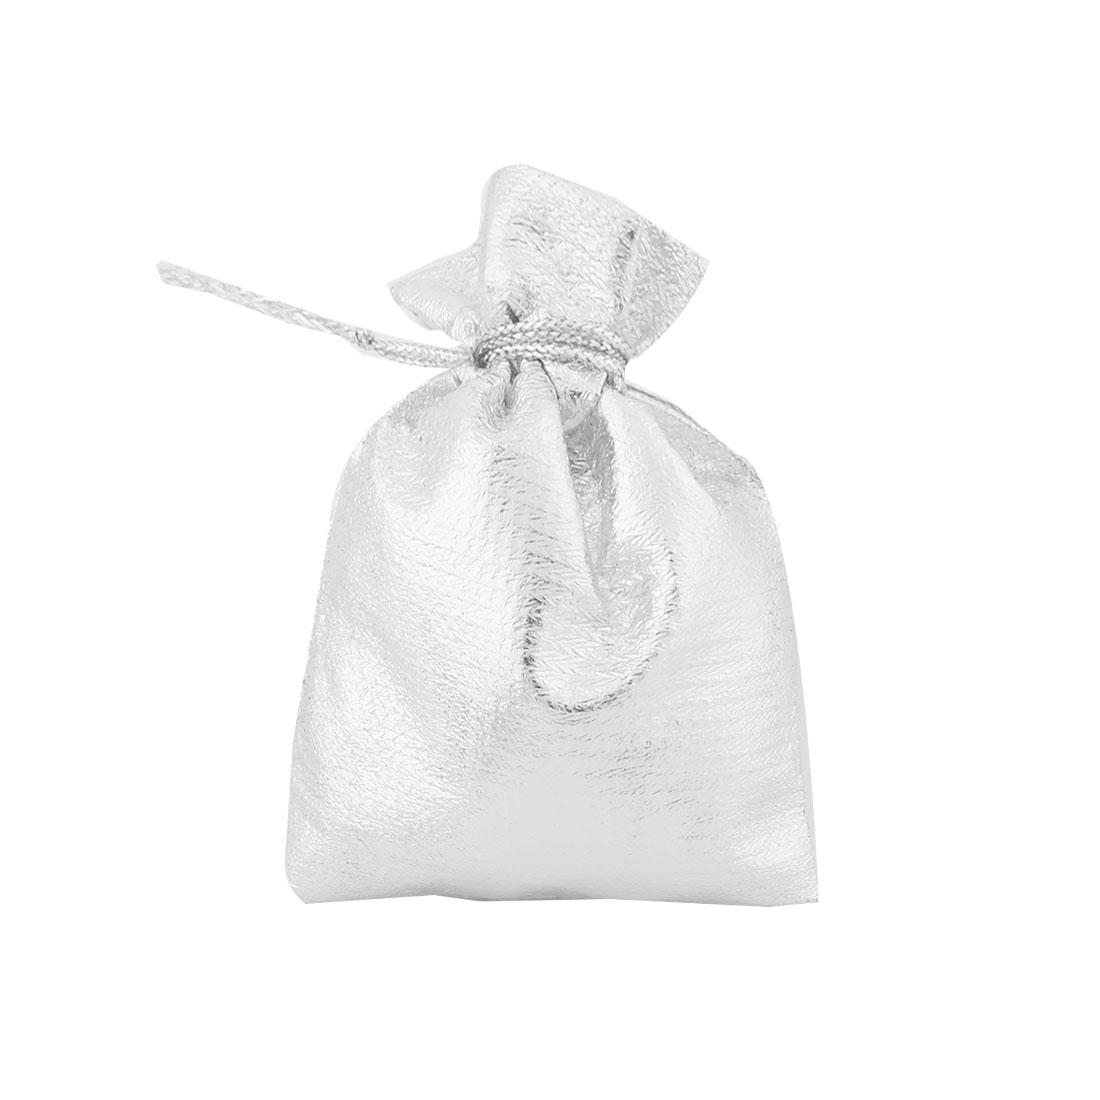 Lady Plastic Gift Jewelry Ring Holder Drawstring Bag Silver Tone 7cm x 5cm 50pcs - image 1 of 4